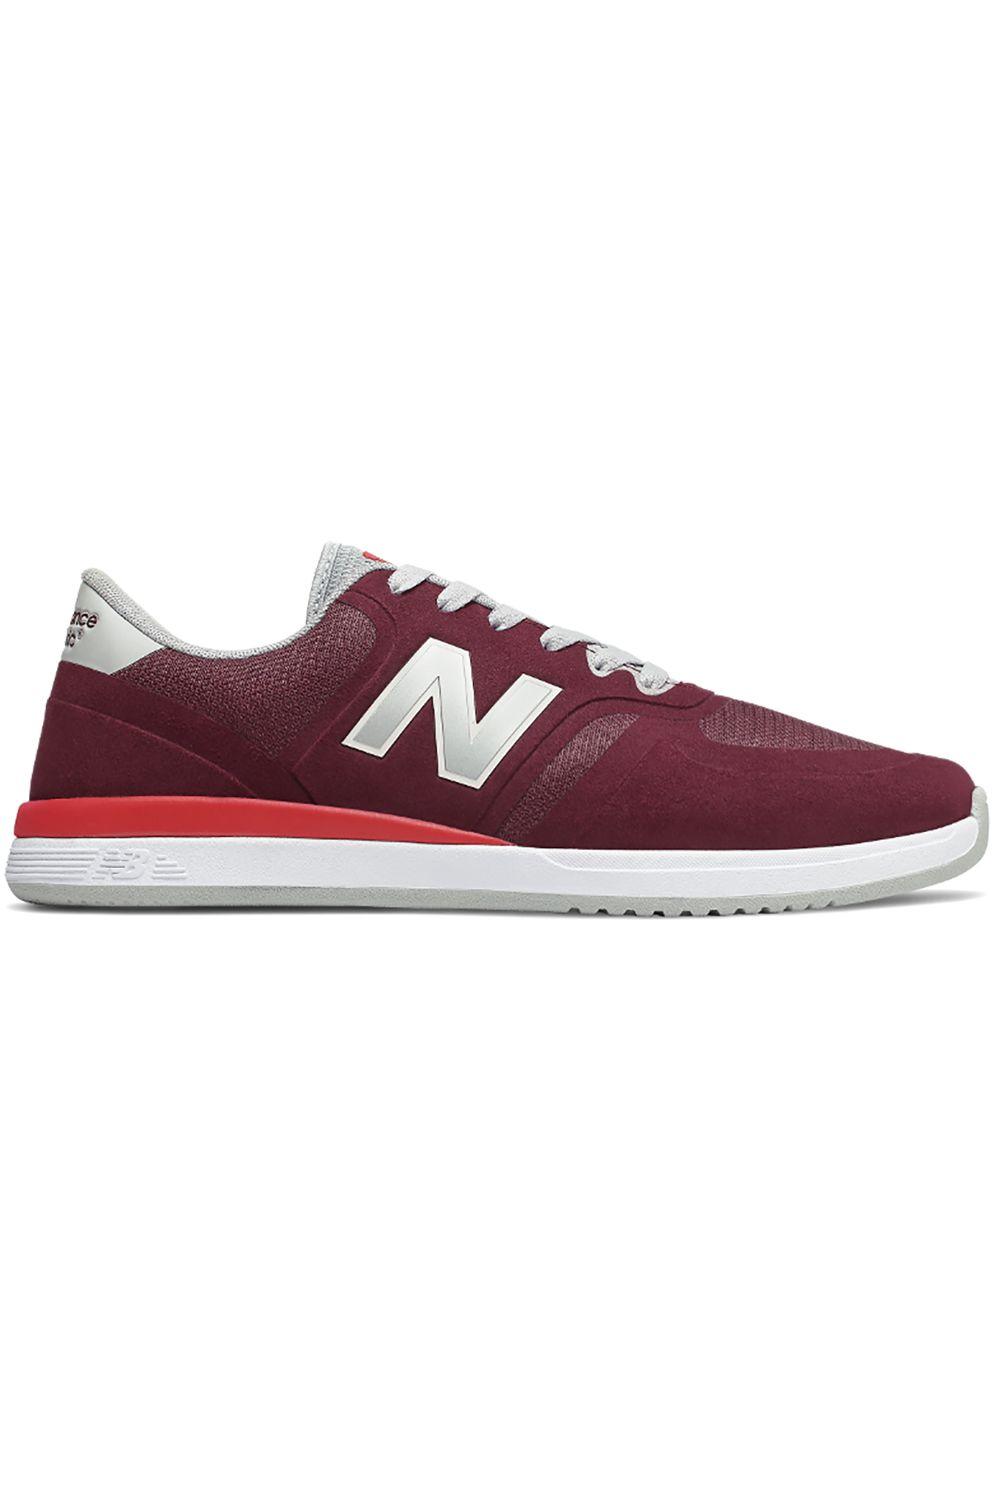 New Balance Shoes NM420 Burgundy